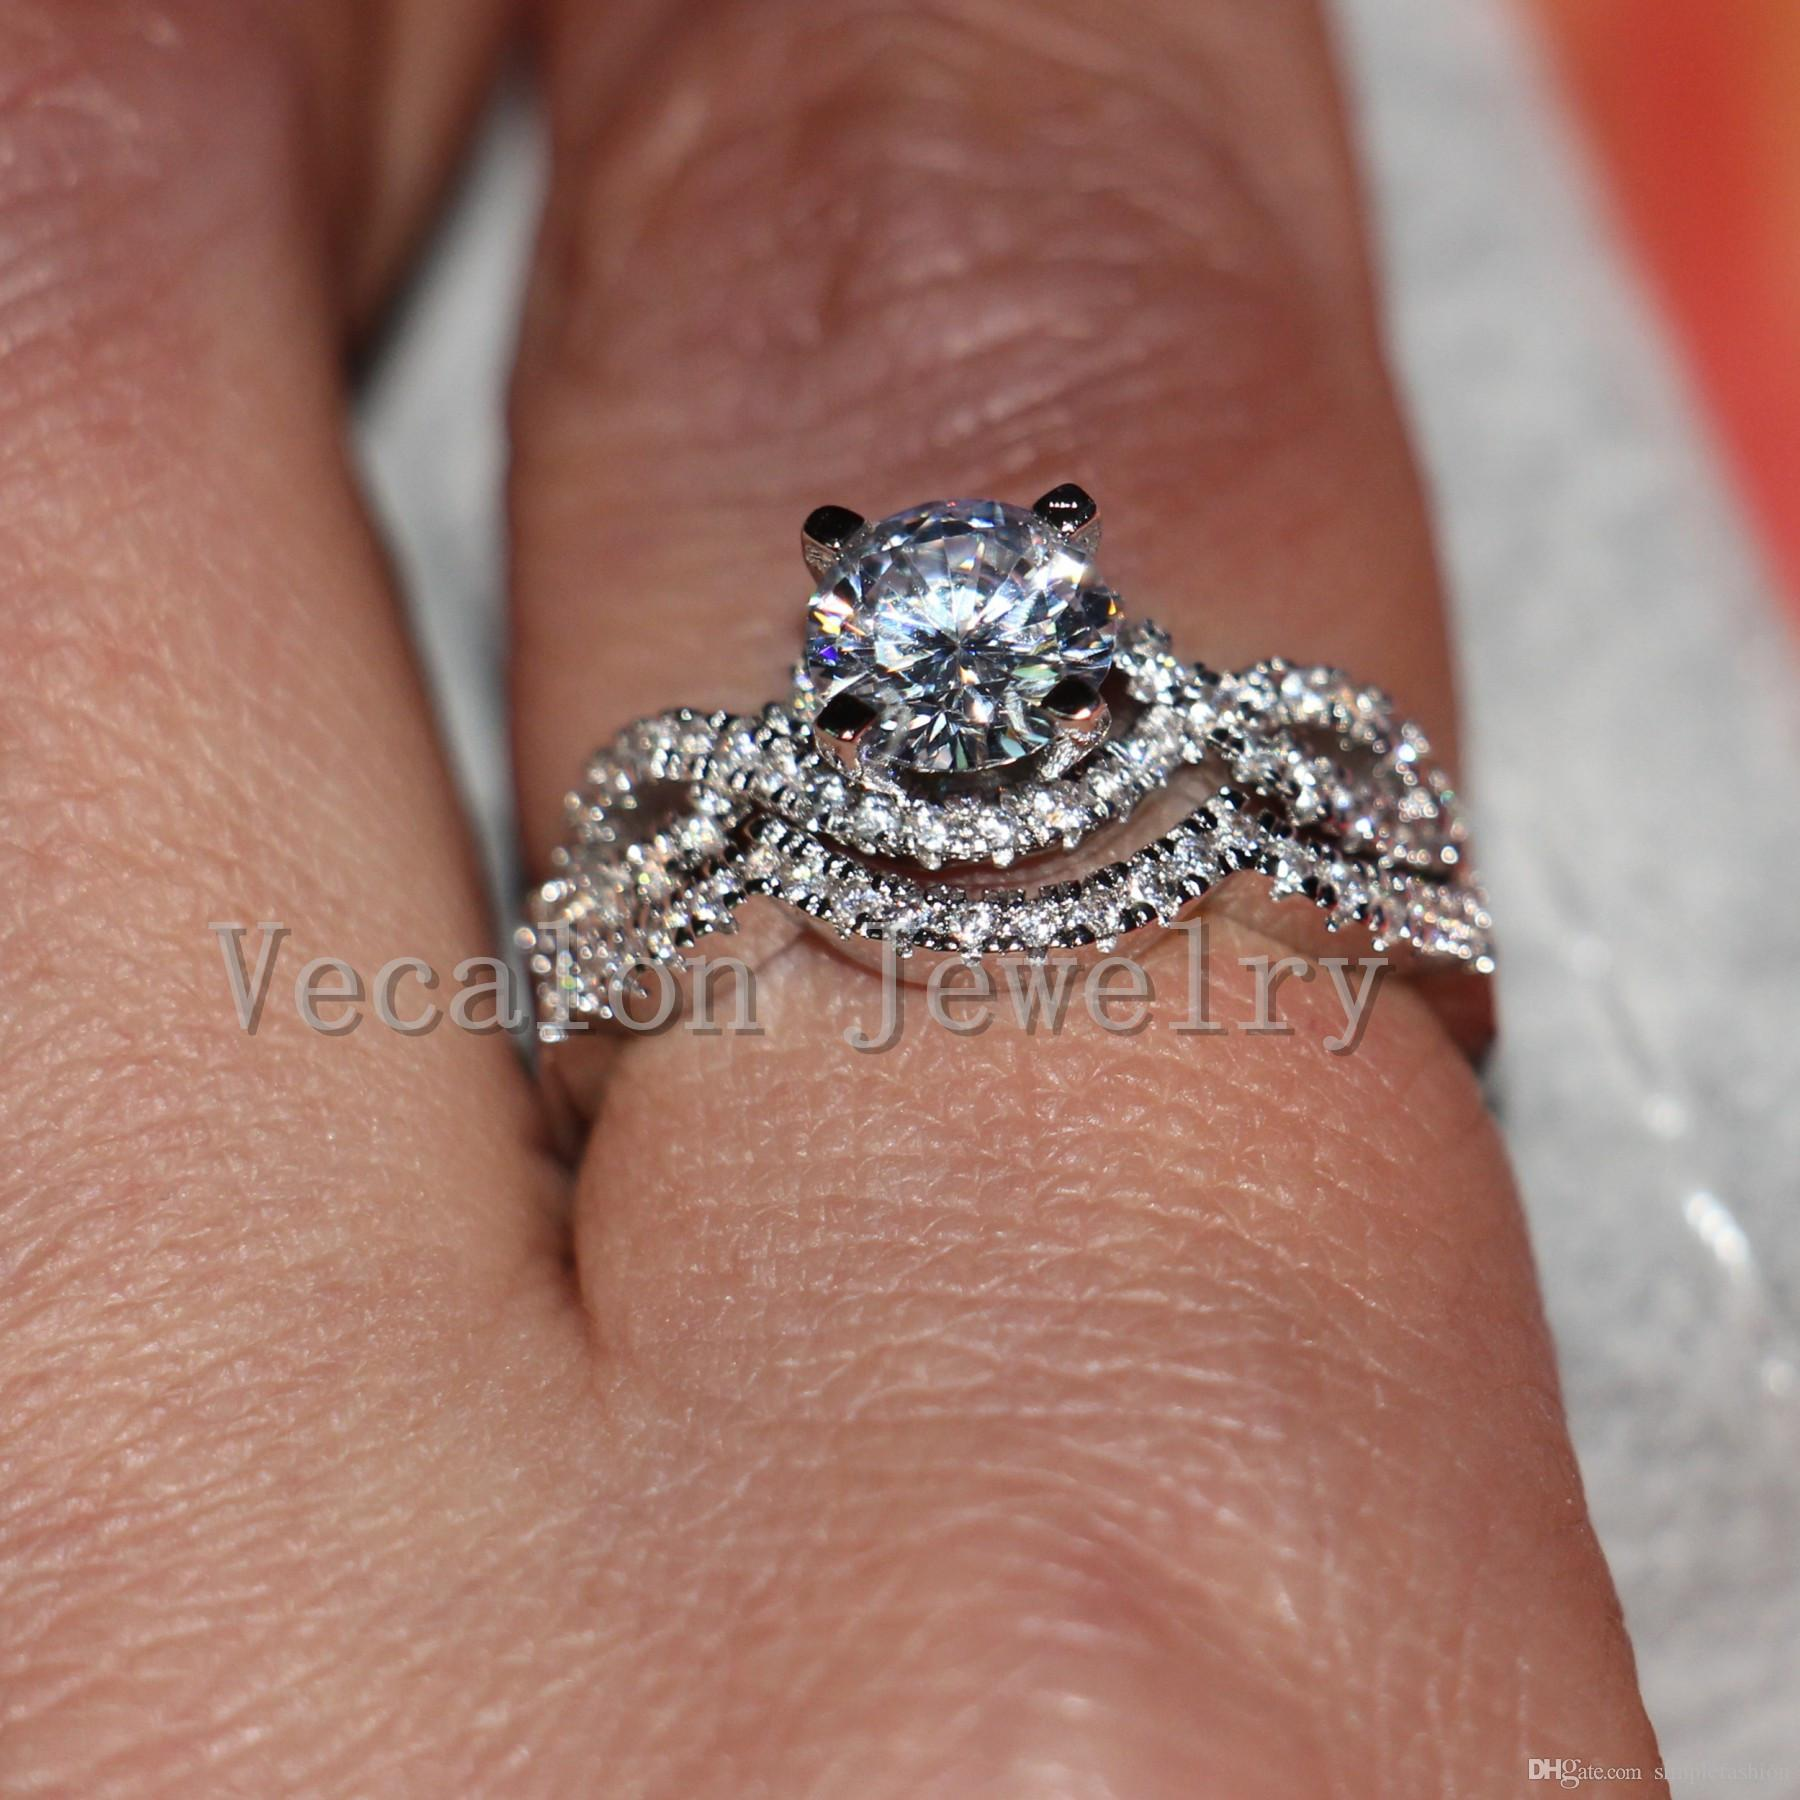 Vecalon Classic Corss Band Wedding Band Set para mujeres Diamante simulado Cz 10KT White Gold Filled Women Party ring